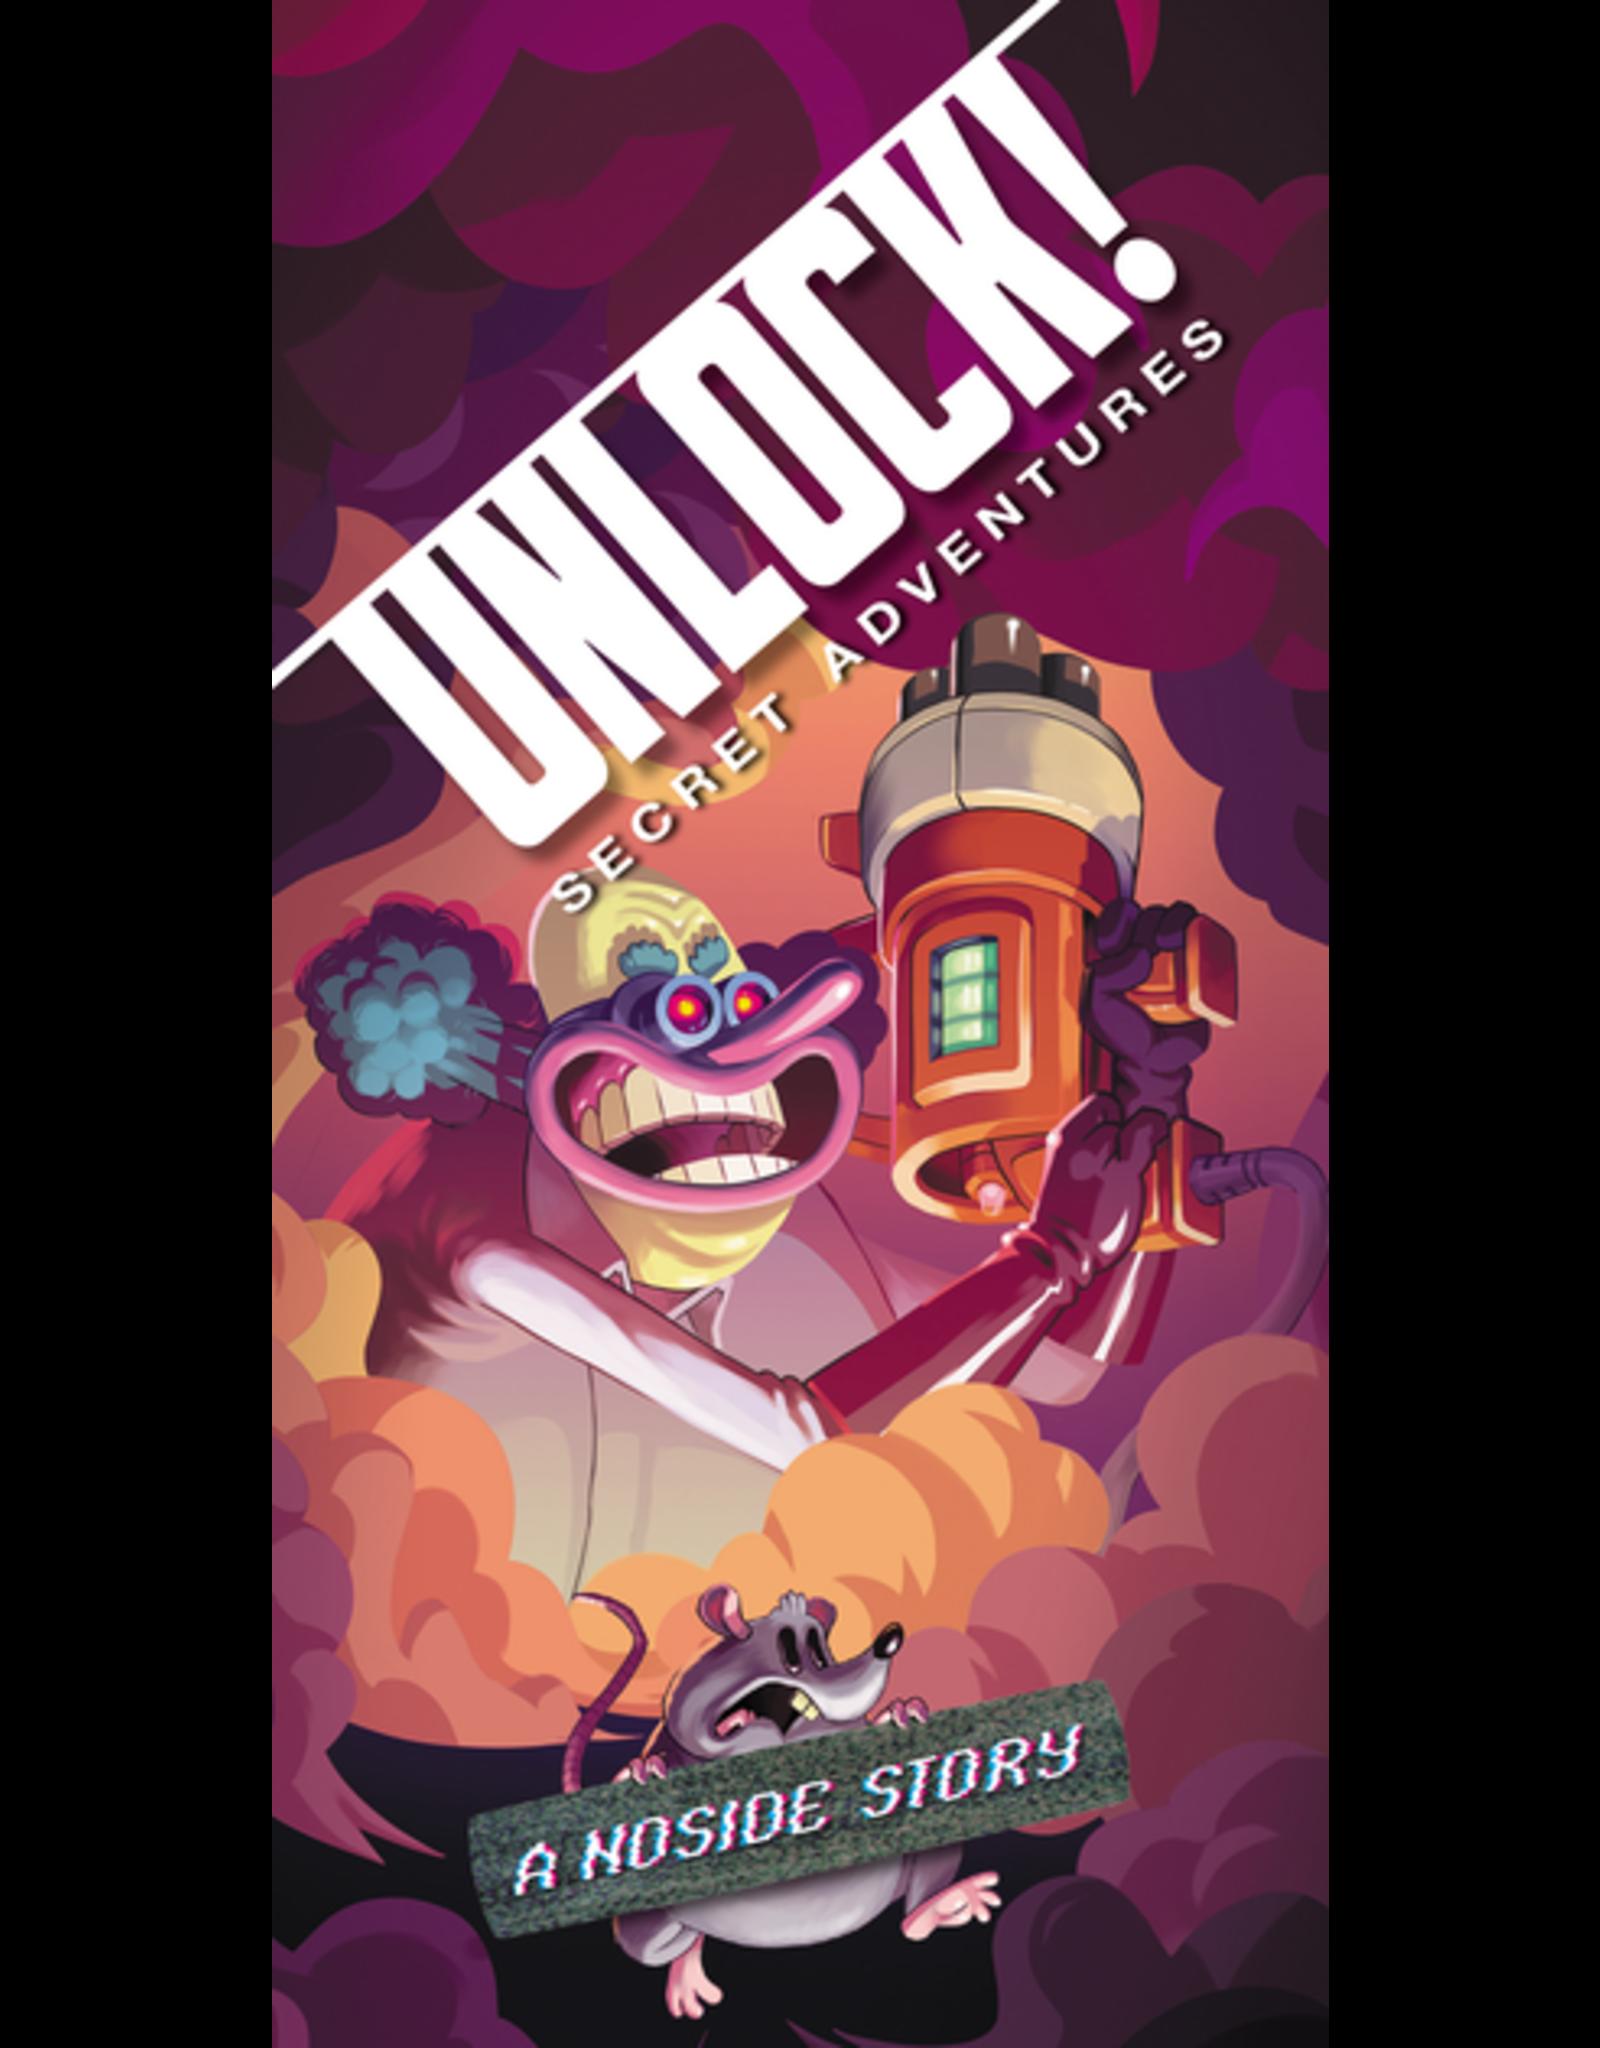 Asmodee Unlock!: A Noside Story